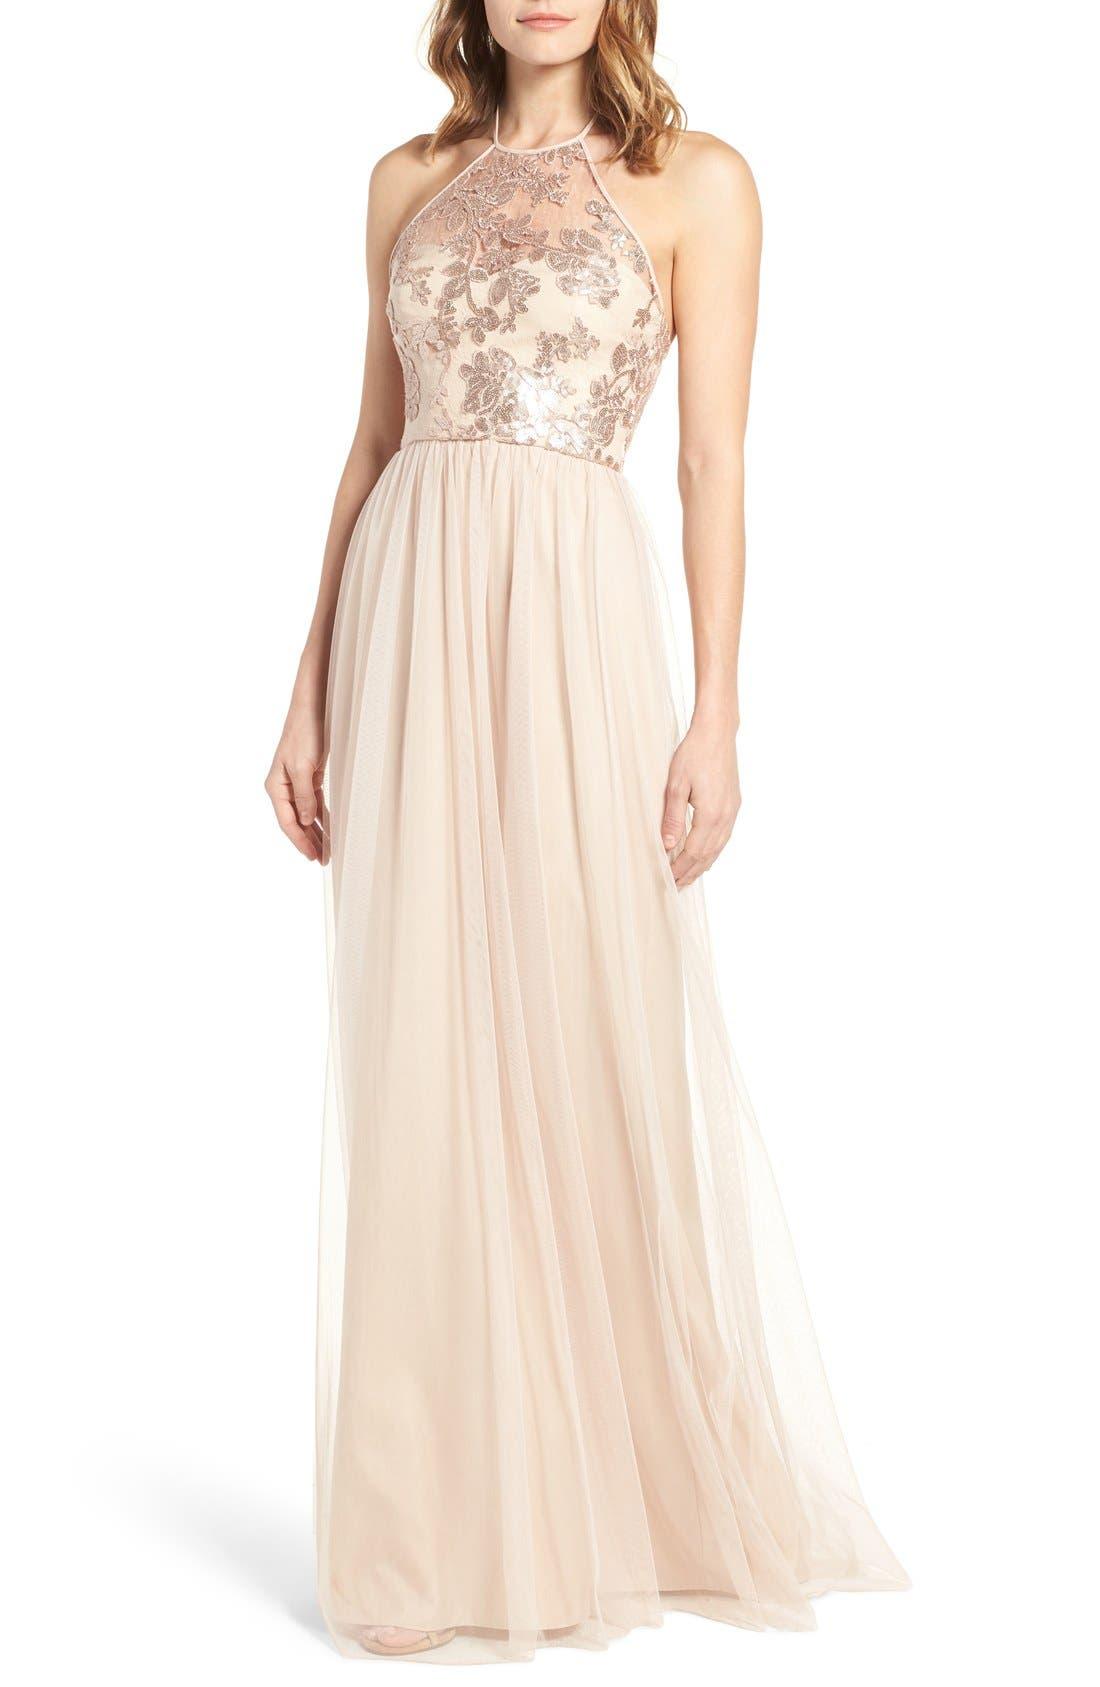 Amsale Sheridan Sequin Halter Dress